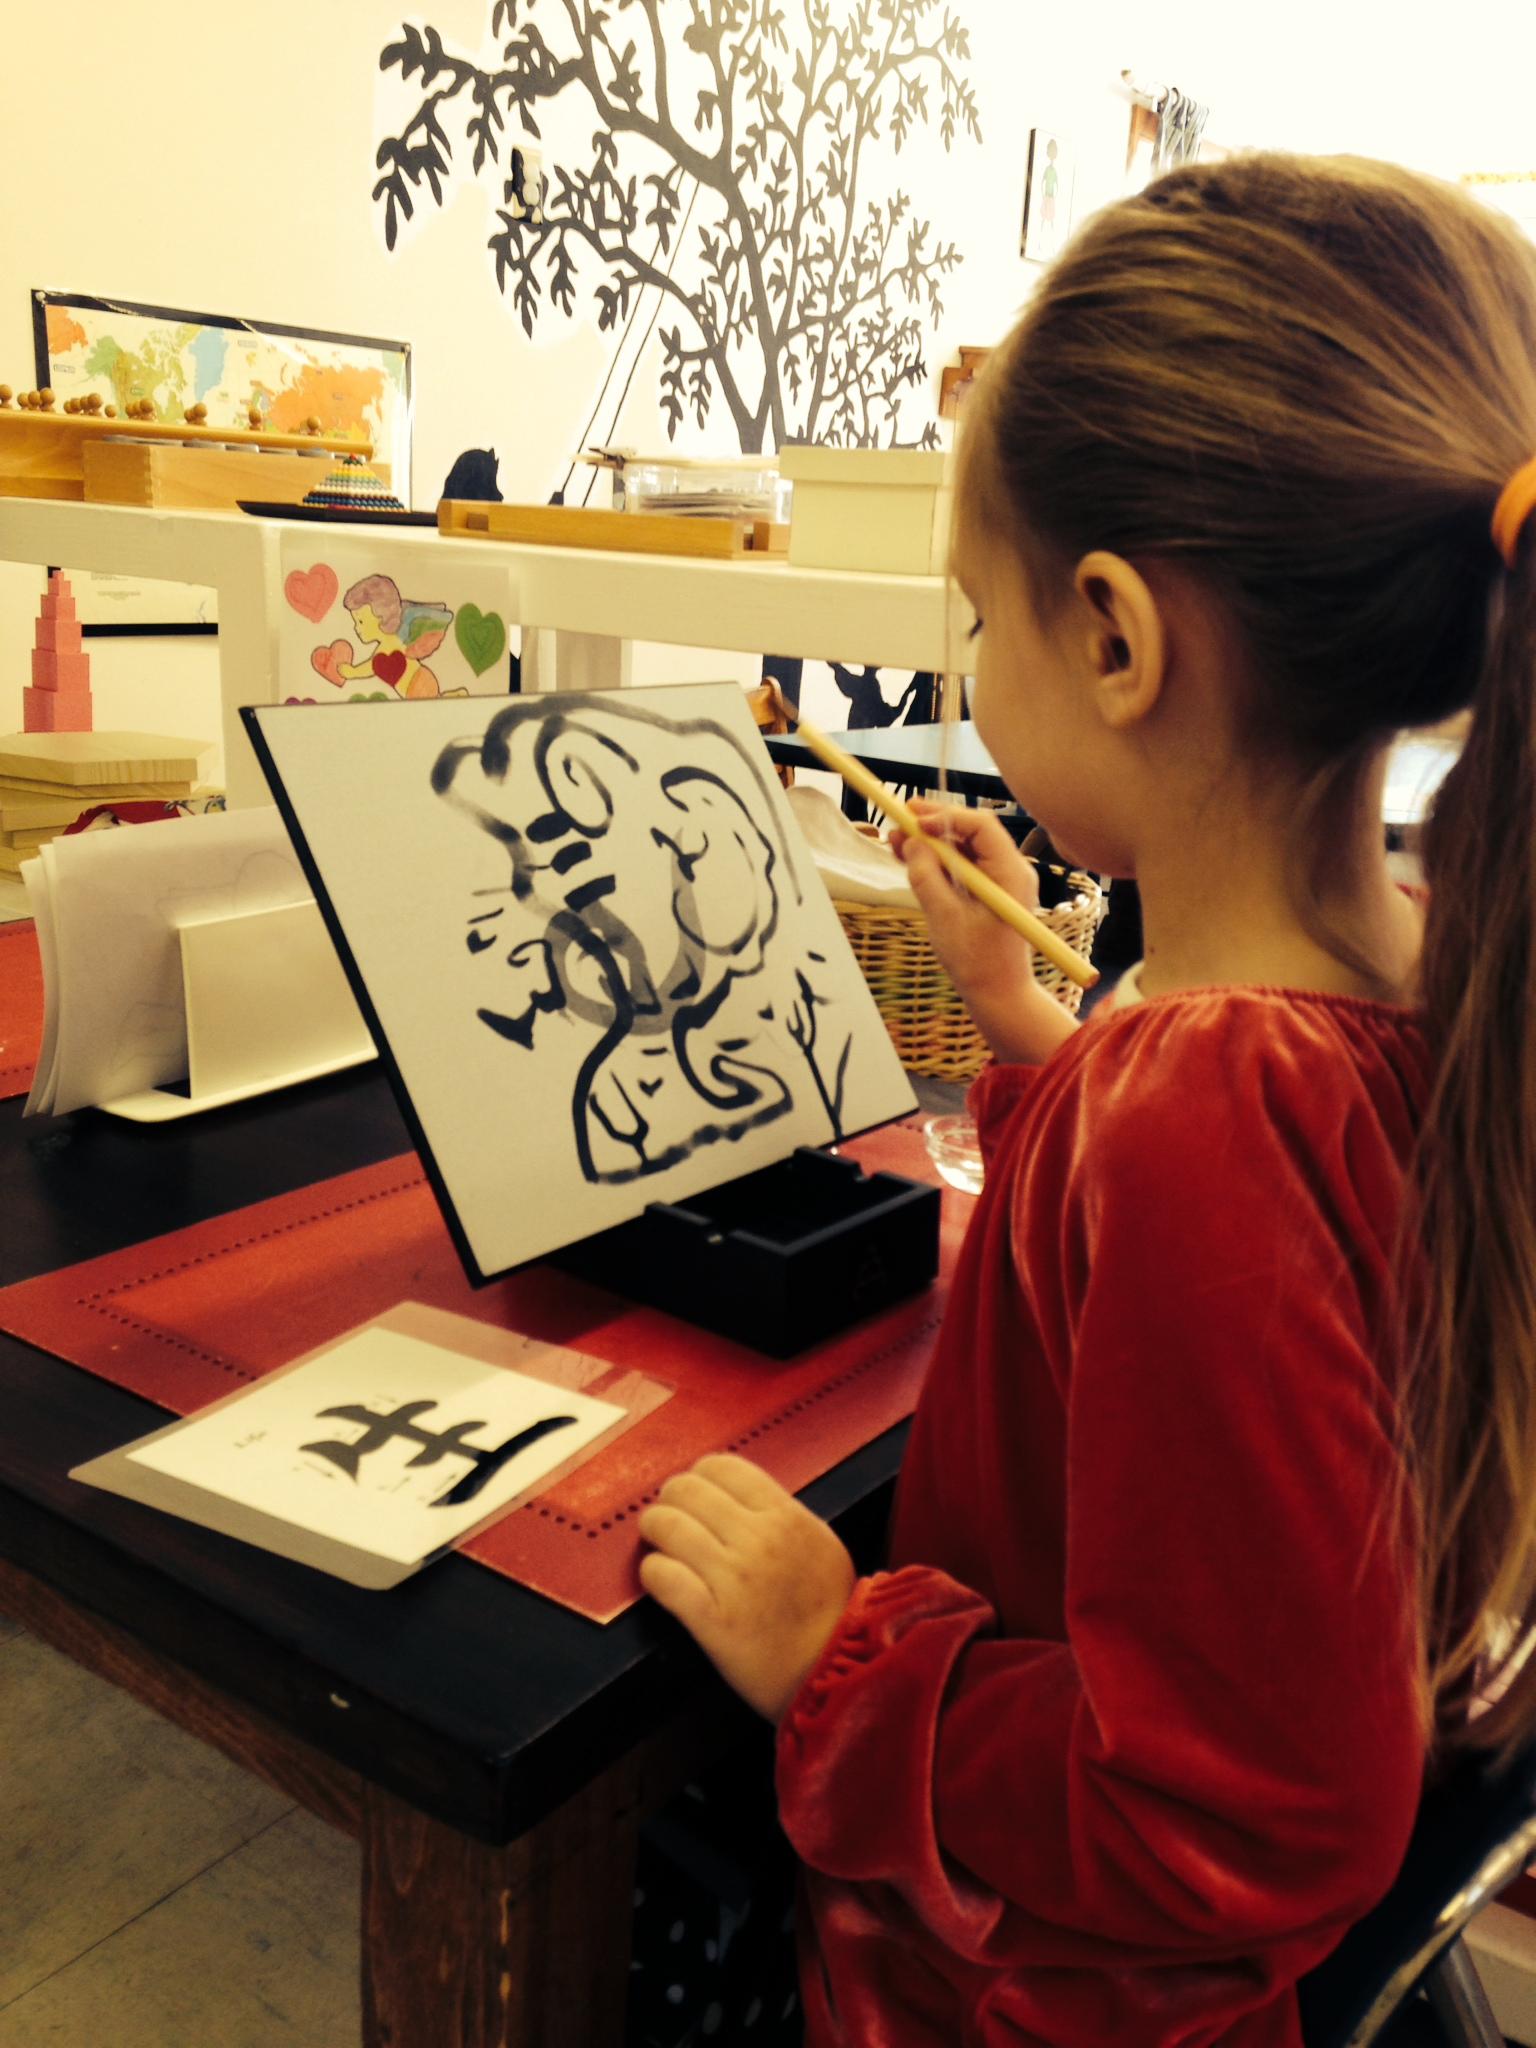 Primary Program (ages 3-6)